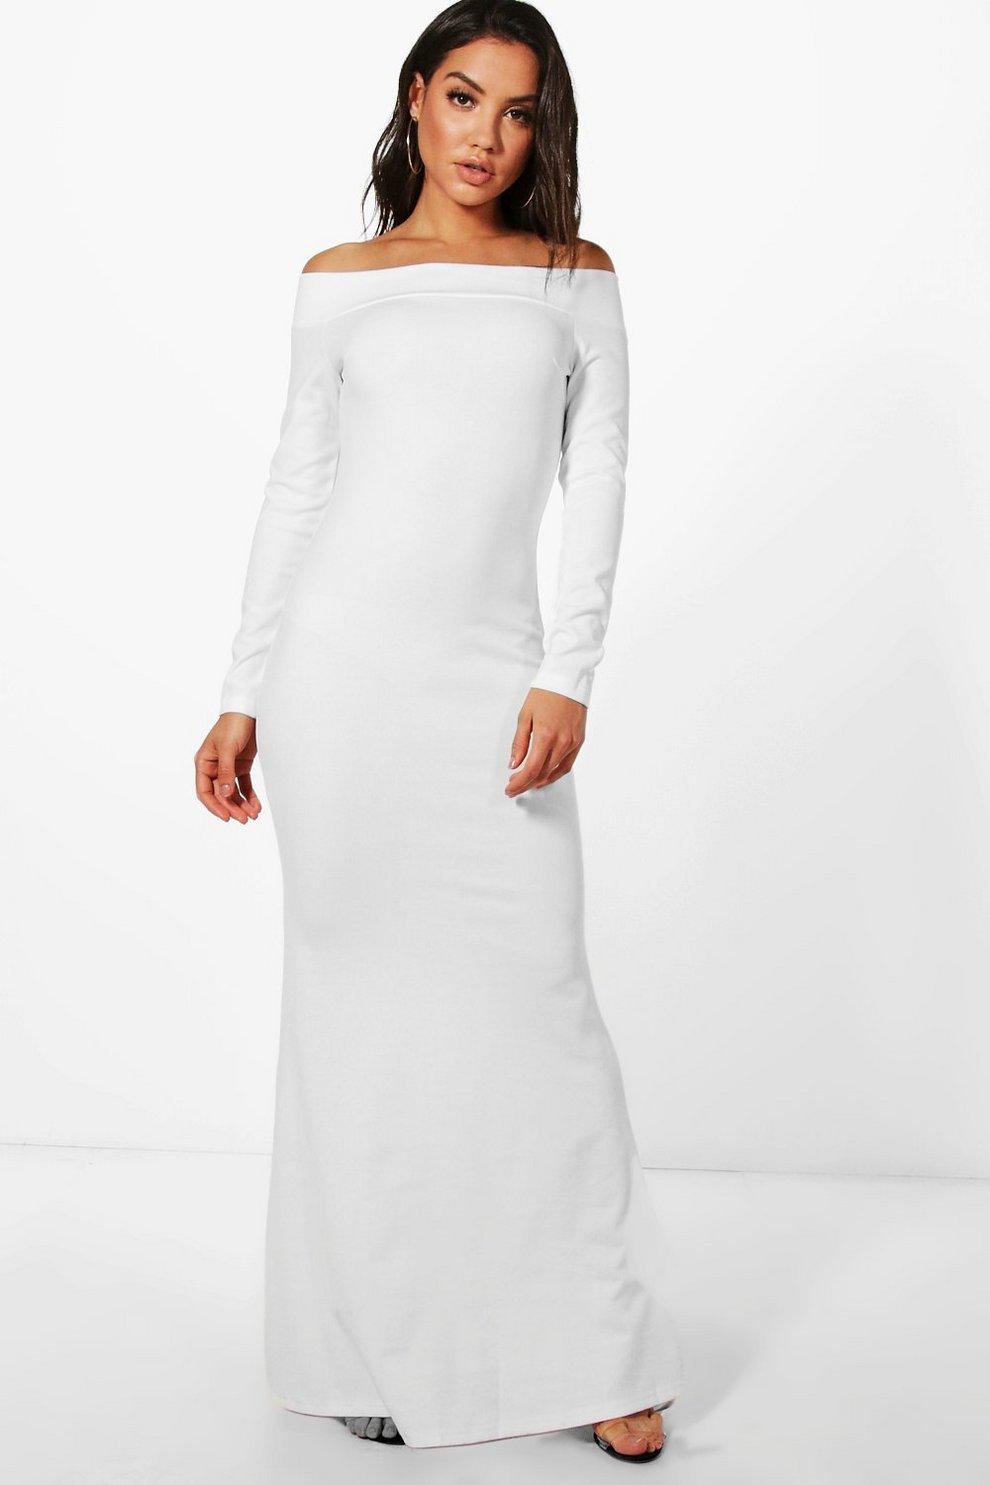 b9667f666e6 Fliss Off Shoulder Long Sleeve Maxi Dress | Boohoo